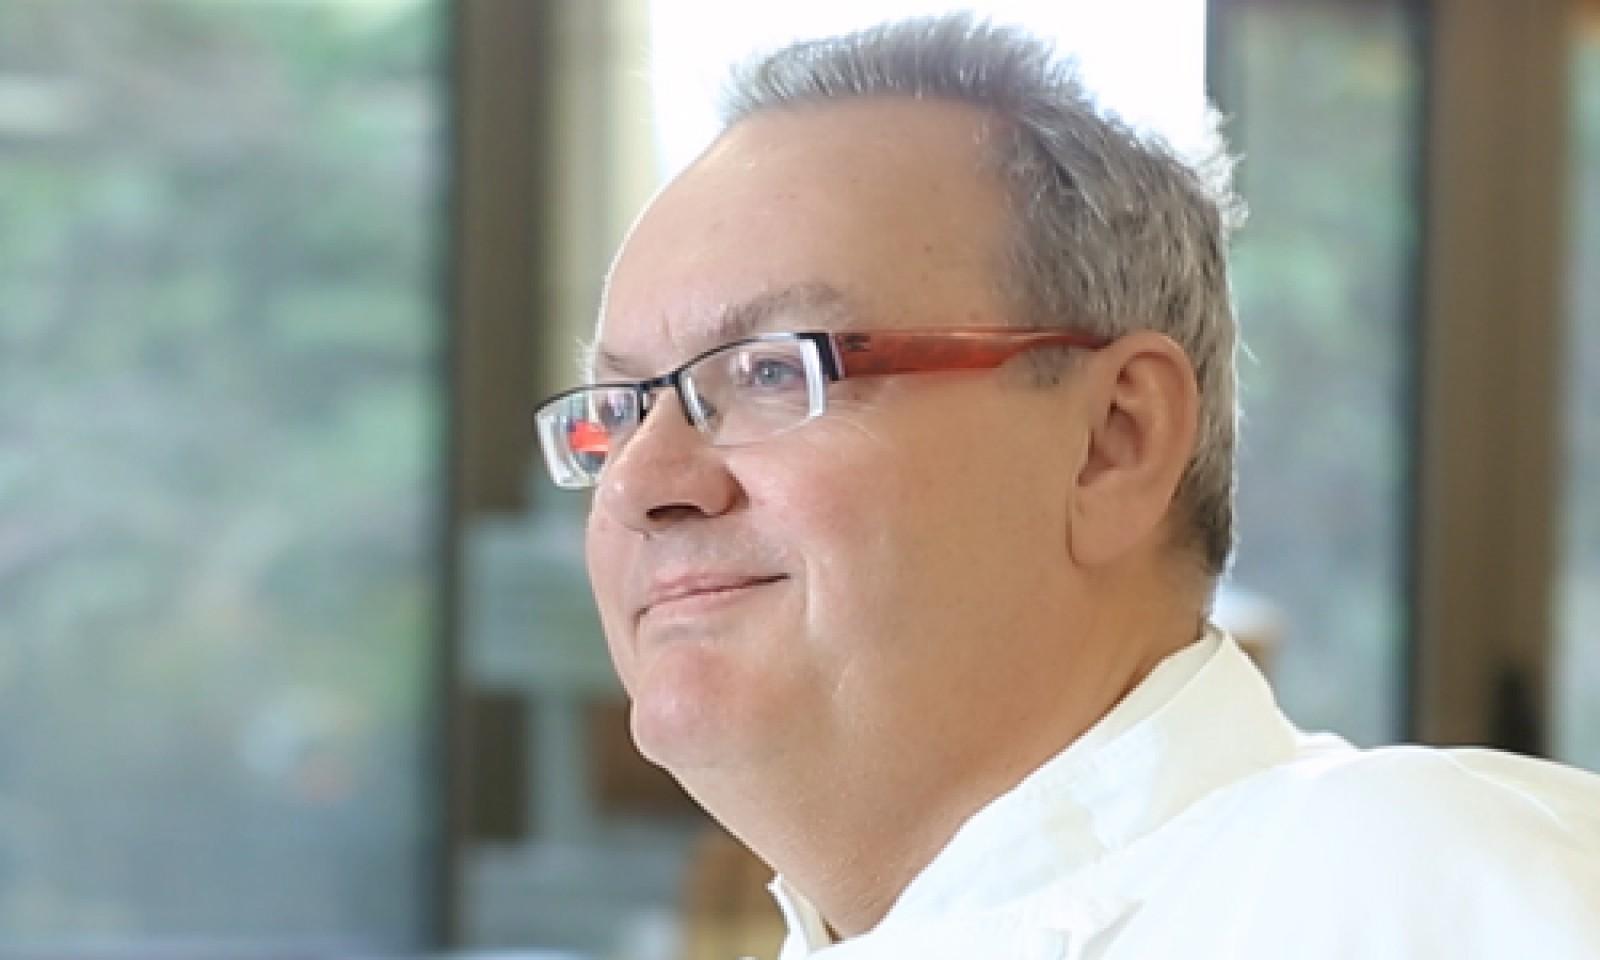 Küchendirektor Thomas Röttele empfiehlt: